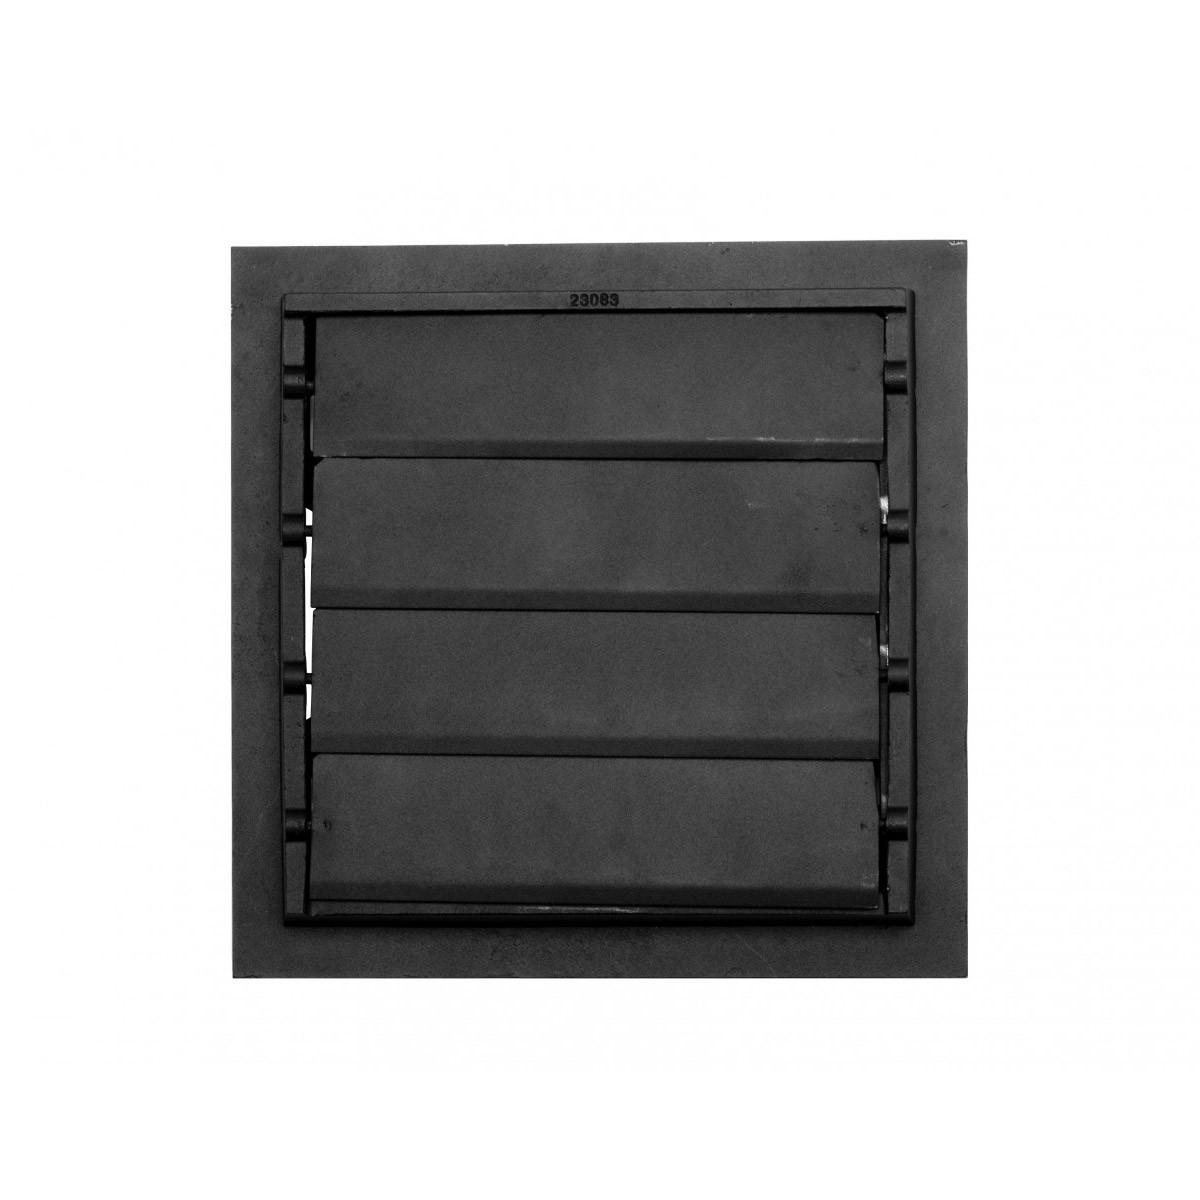 8 Floor Heat Register Louver Vent Victorian Cast 12 x 12 Duct Heat Register Floor Register Wall Registers